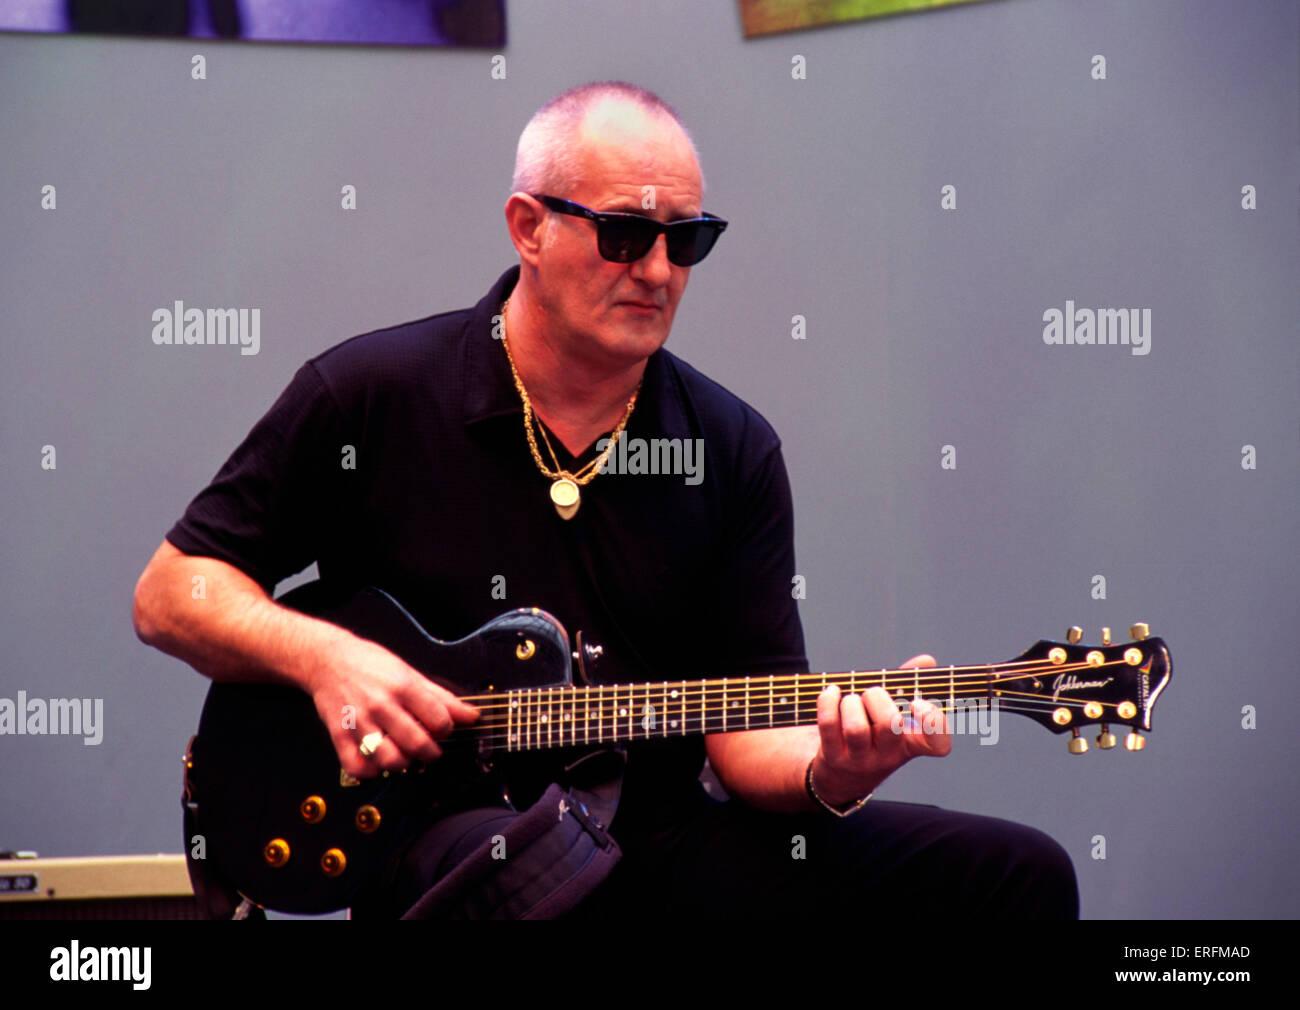 Jan Ackerman - portrait of the Dutch guitarist giving a guitar demo at the 2000 Frankfurt Music Fair, Germany. - Stock Image